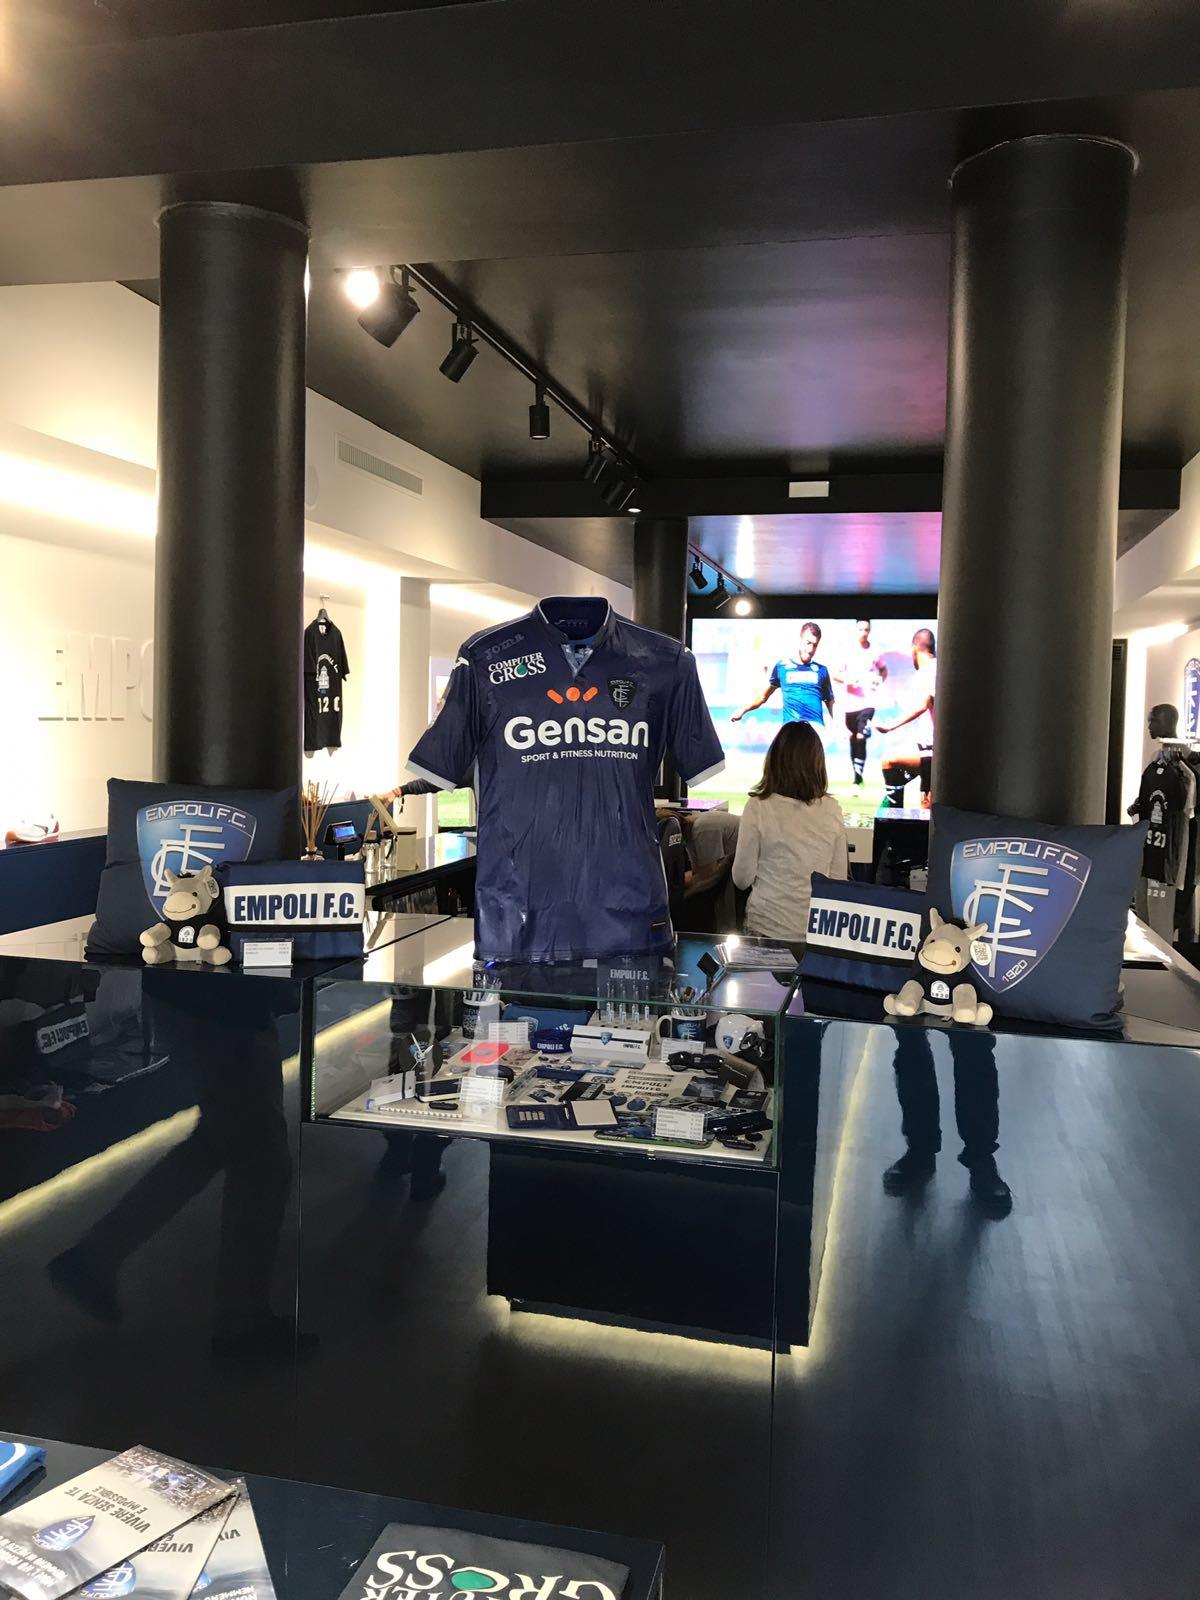 negozio Empoli Football club